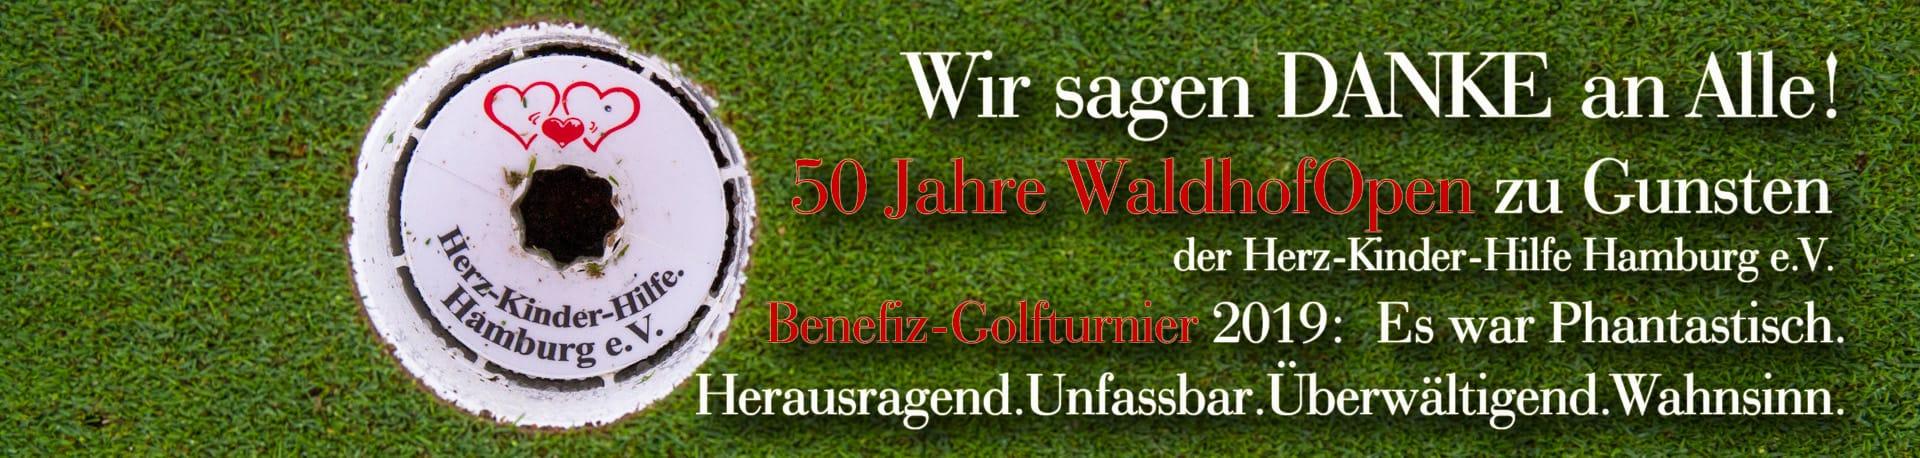 HKH-Homepage-Slider_Benefiz-Golfturnier-2019-Danke